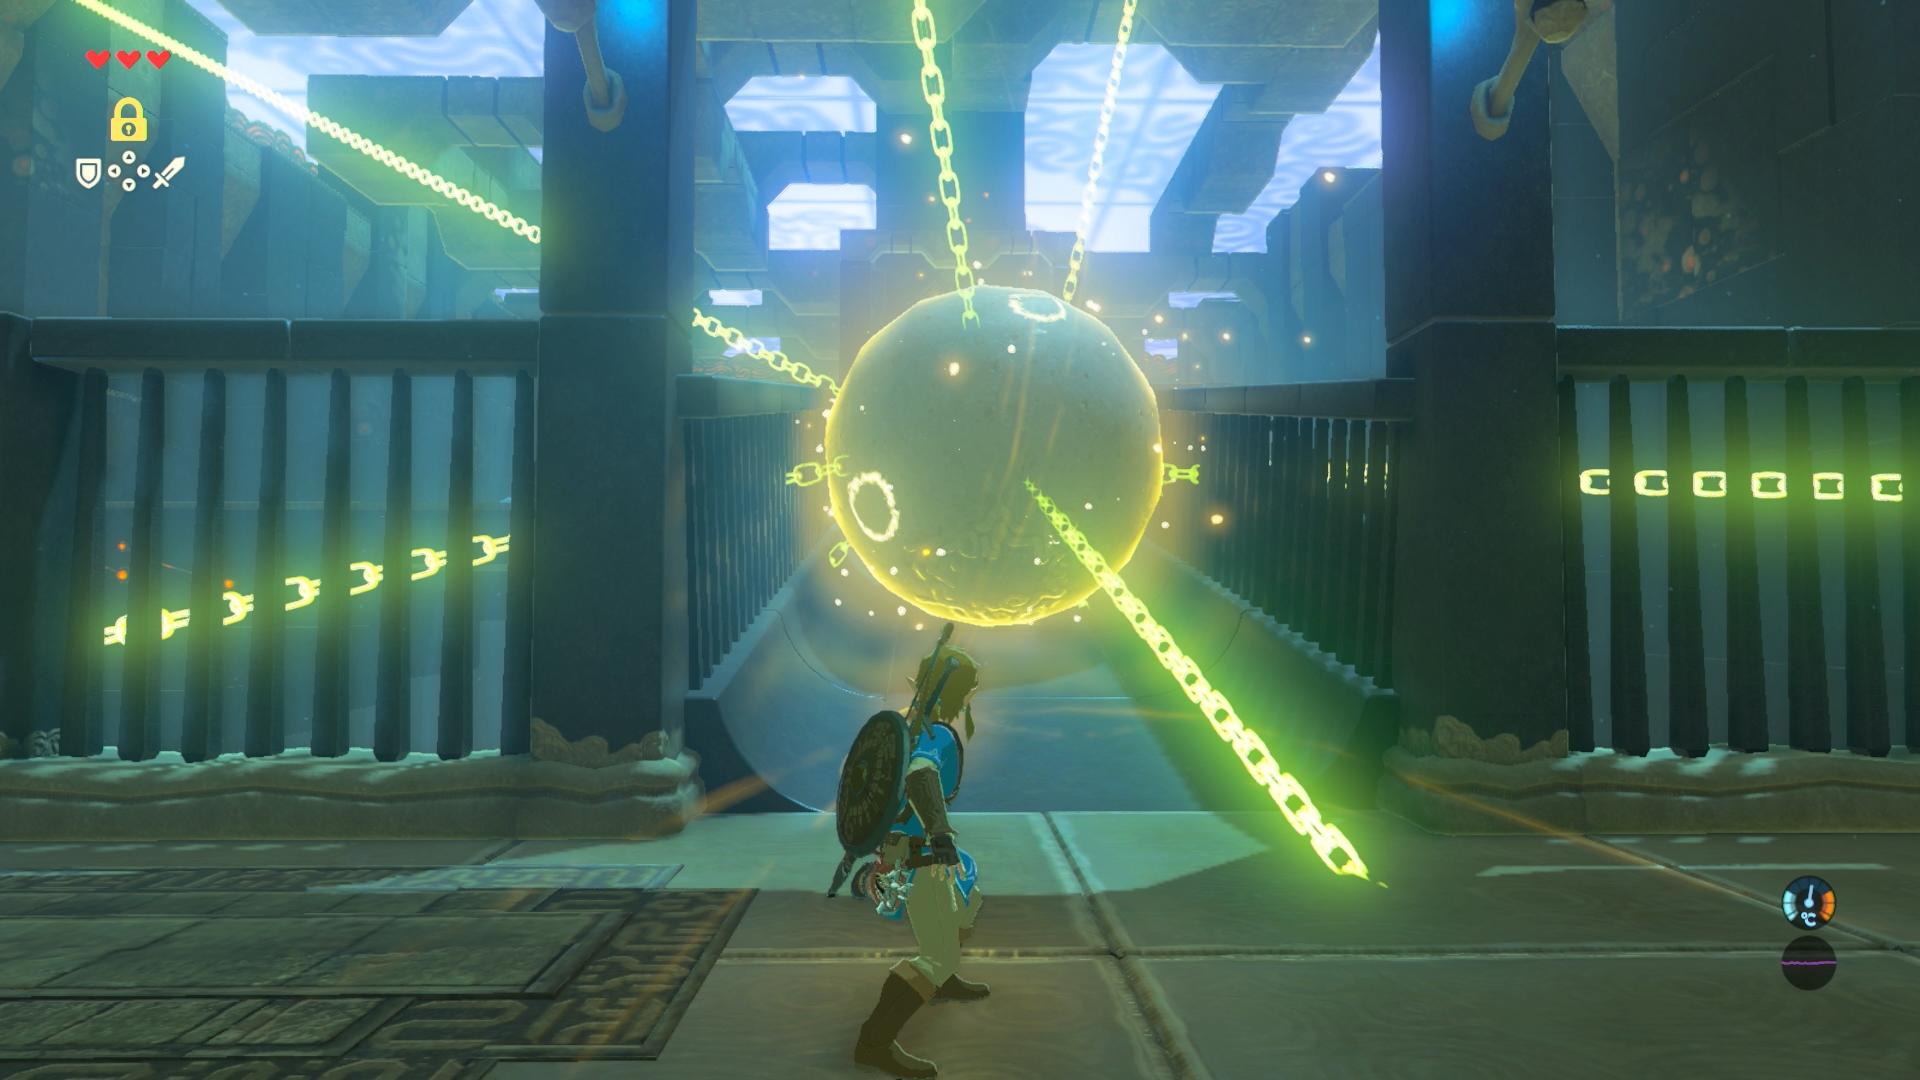 Nové screenshoty z The Legend of Zelda: Breath of the Wild 139310